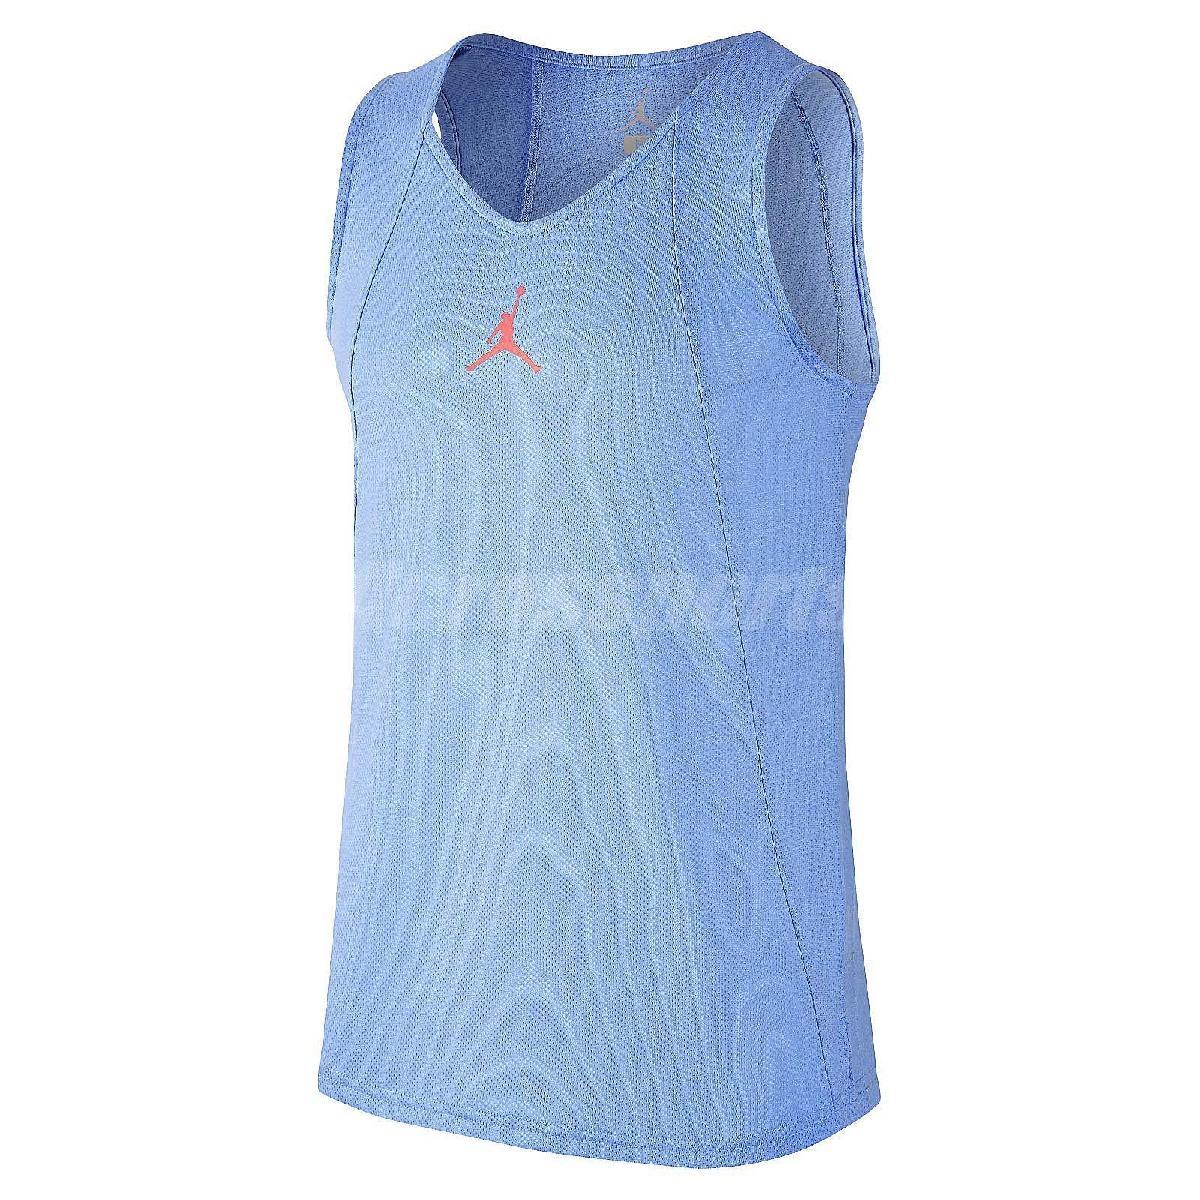 Nike背心Flight Rise Jersey藍橘紅無袖上衣球衣男款PUMP306 789481-412